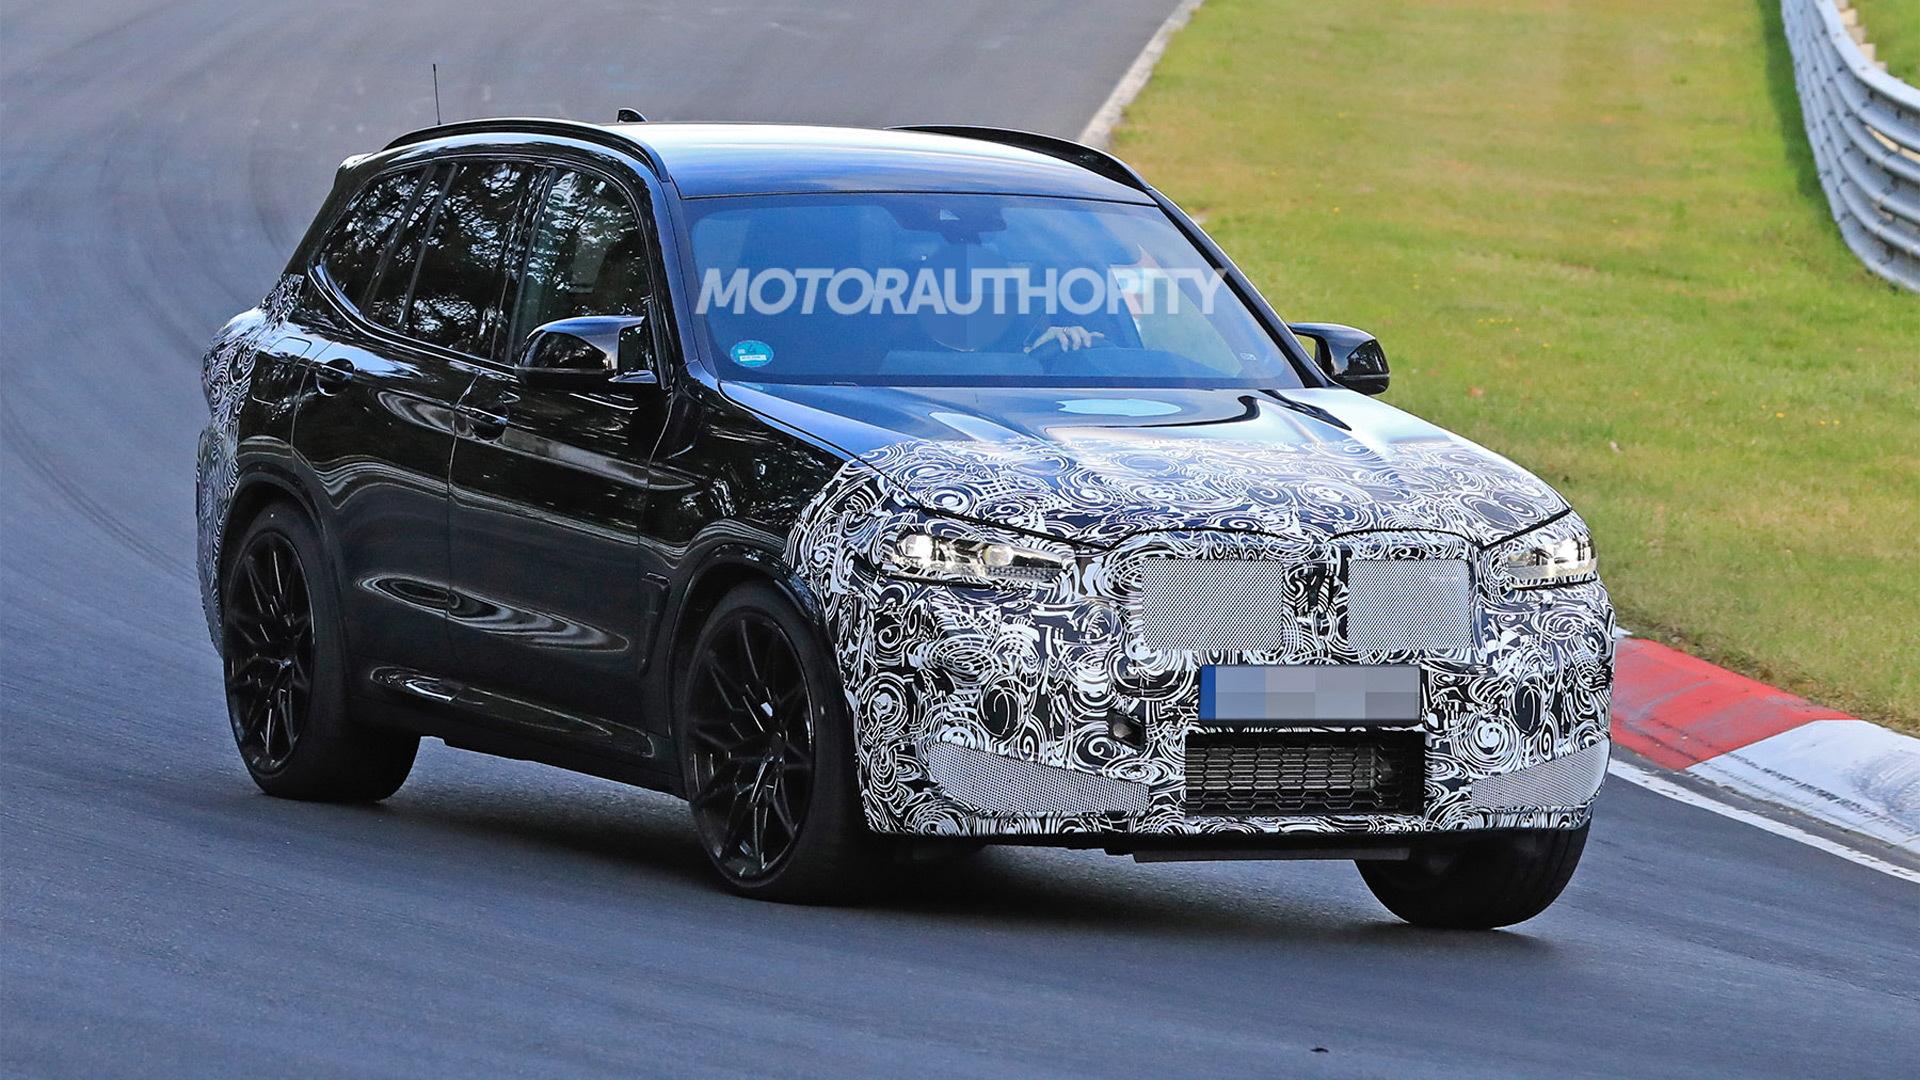 2022 BMW X3 M facelift spy shots - Photo credit:S. Baldauf/SB-Medien